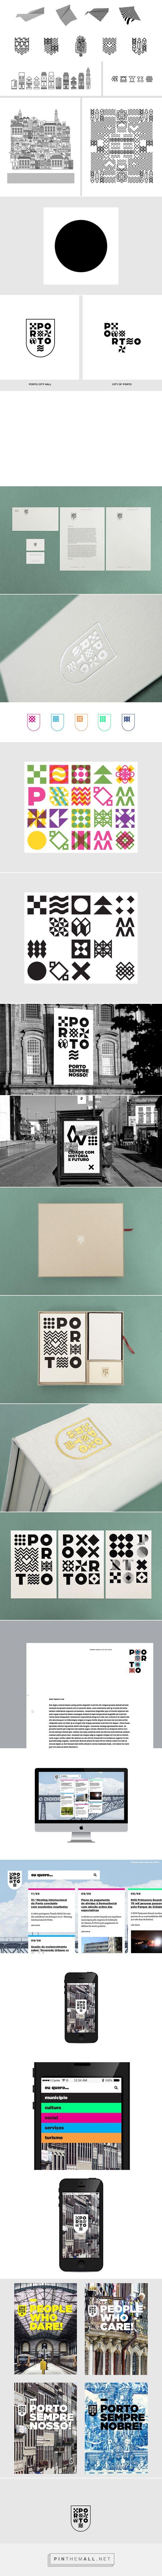 Porto / City Identity and Branding Proposal on Behance - https://www.behance.net/gallery/19950165/Porto-City-Identity-and-Branding-Proposal